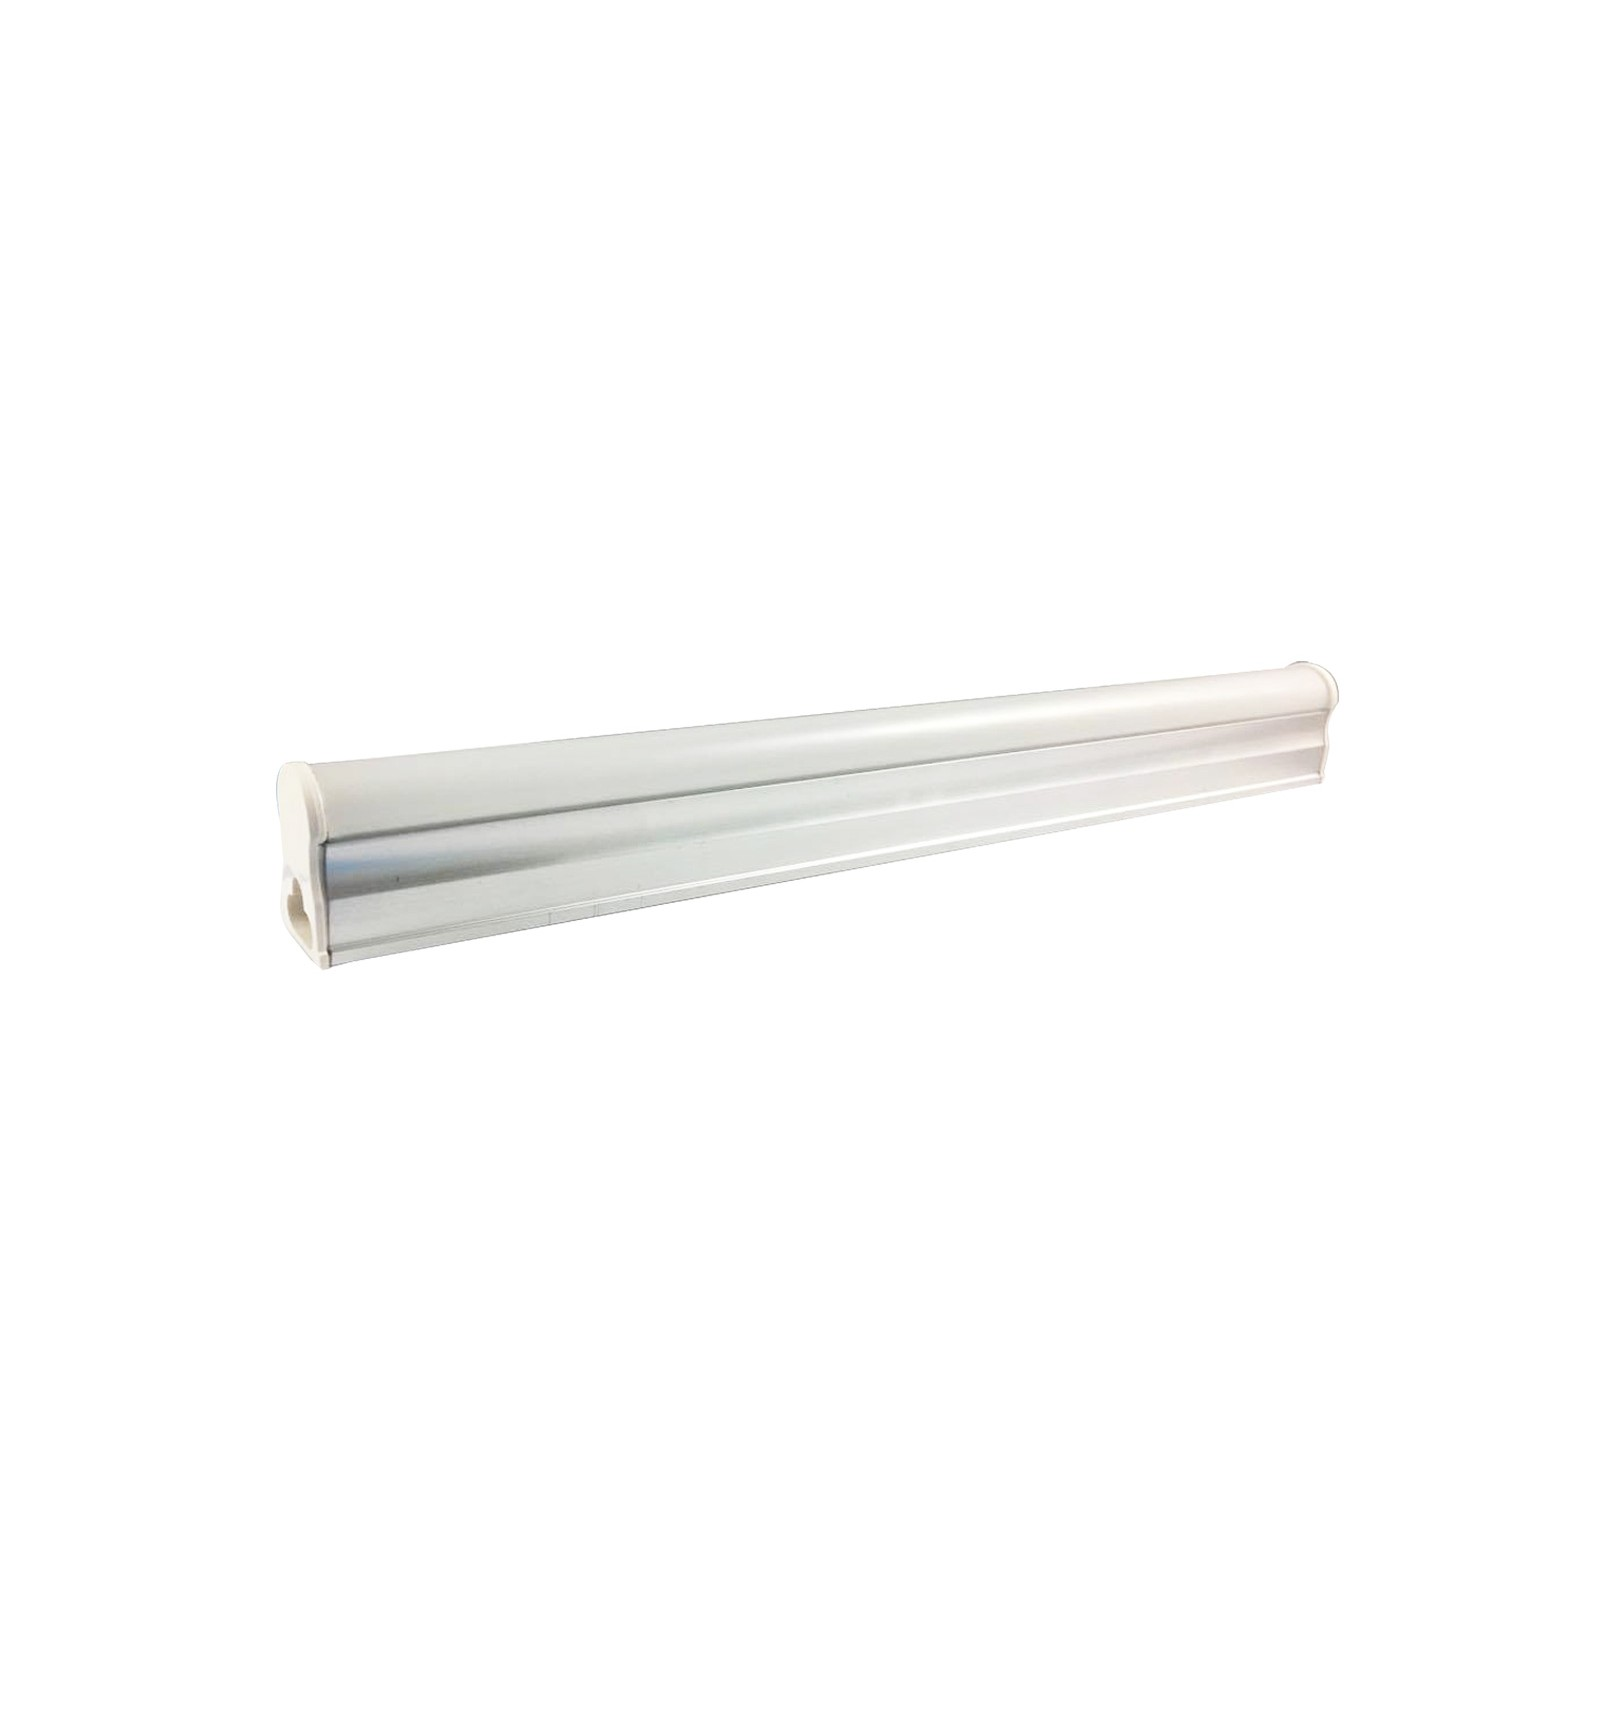 tube led t5 8w blanc froid 6000k longueur 60cm. Black Bedroom Furniture Sets. Home Design Ideas